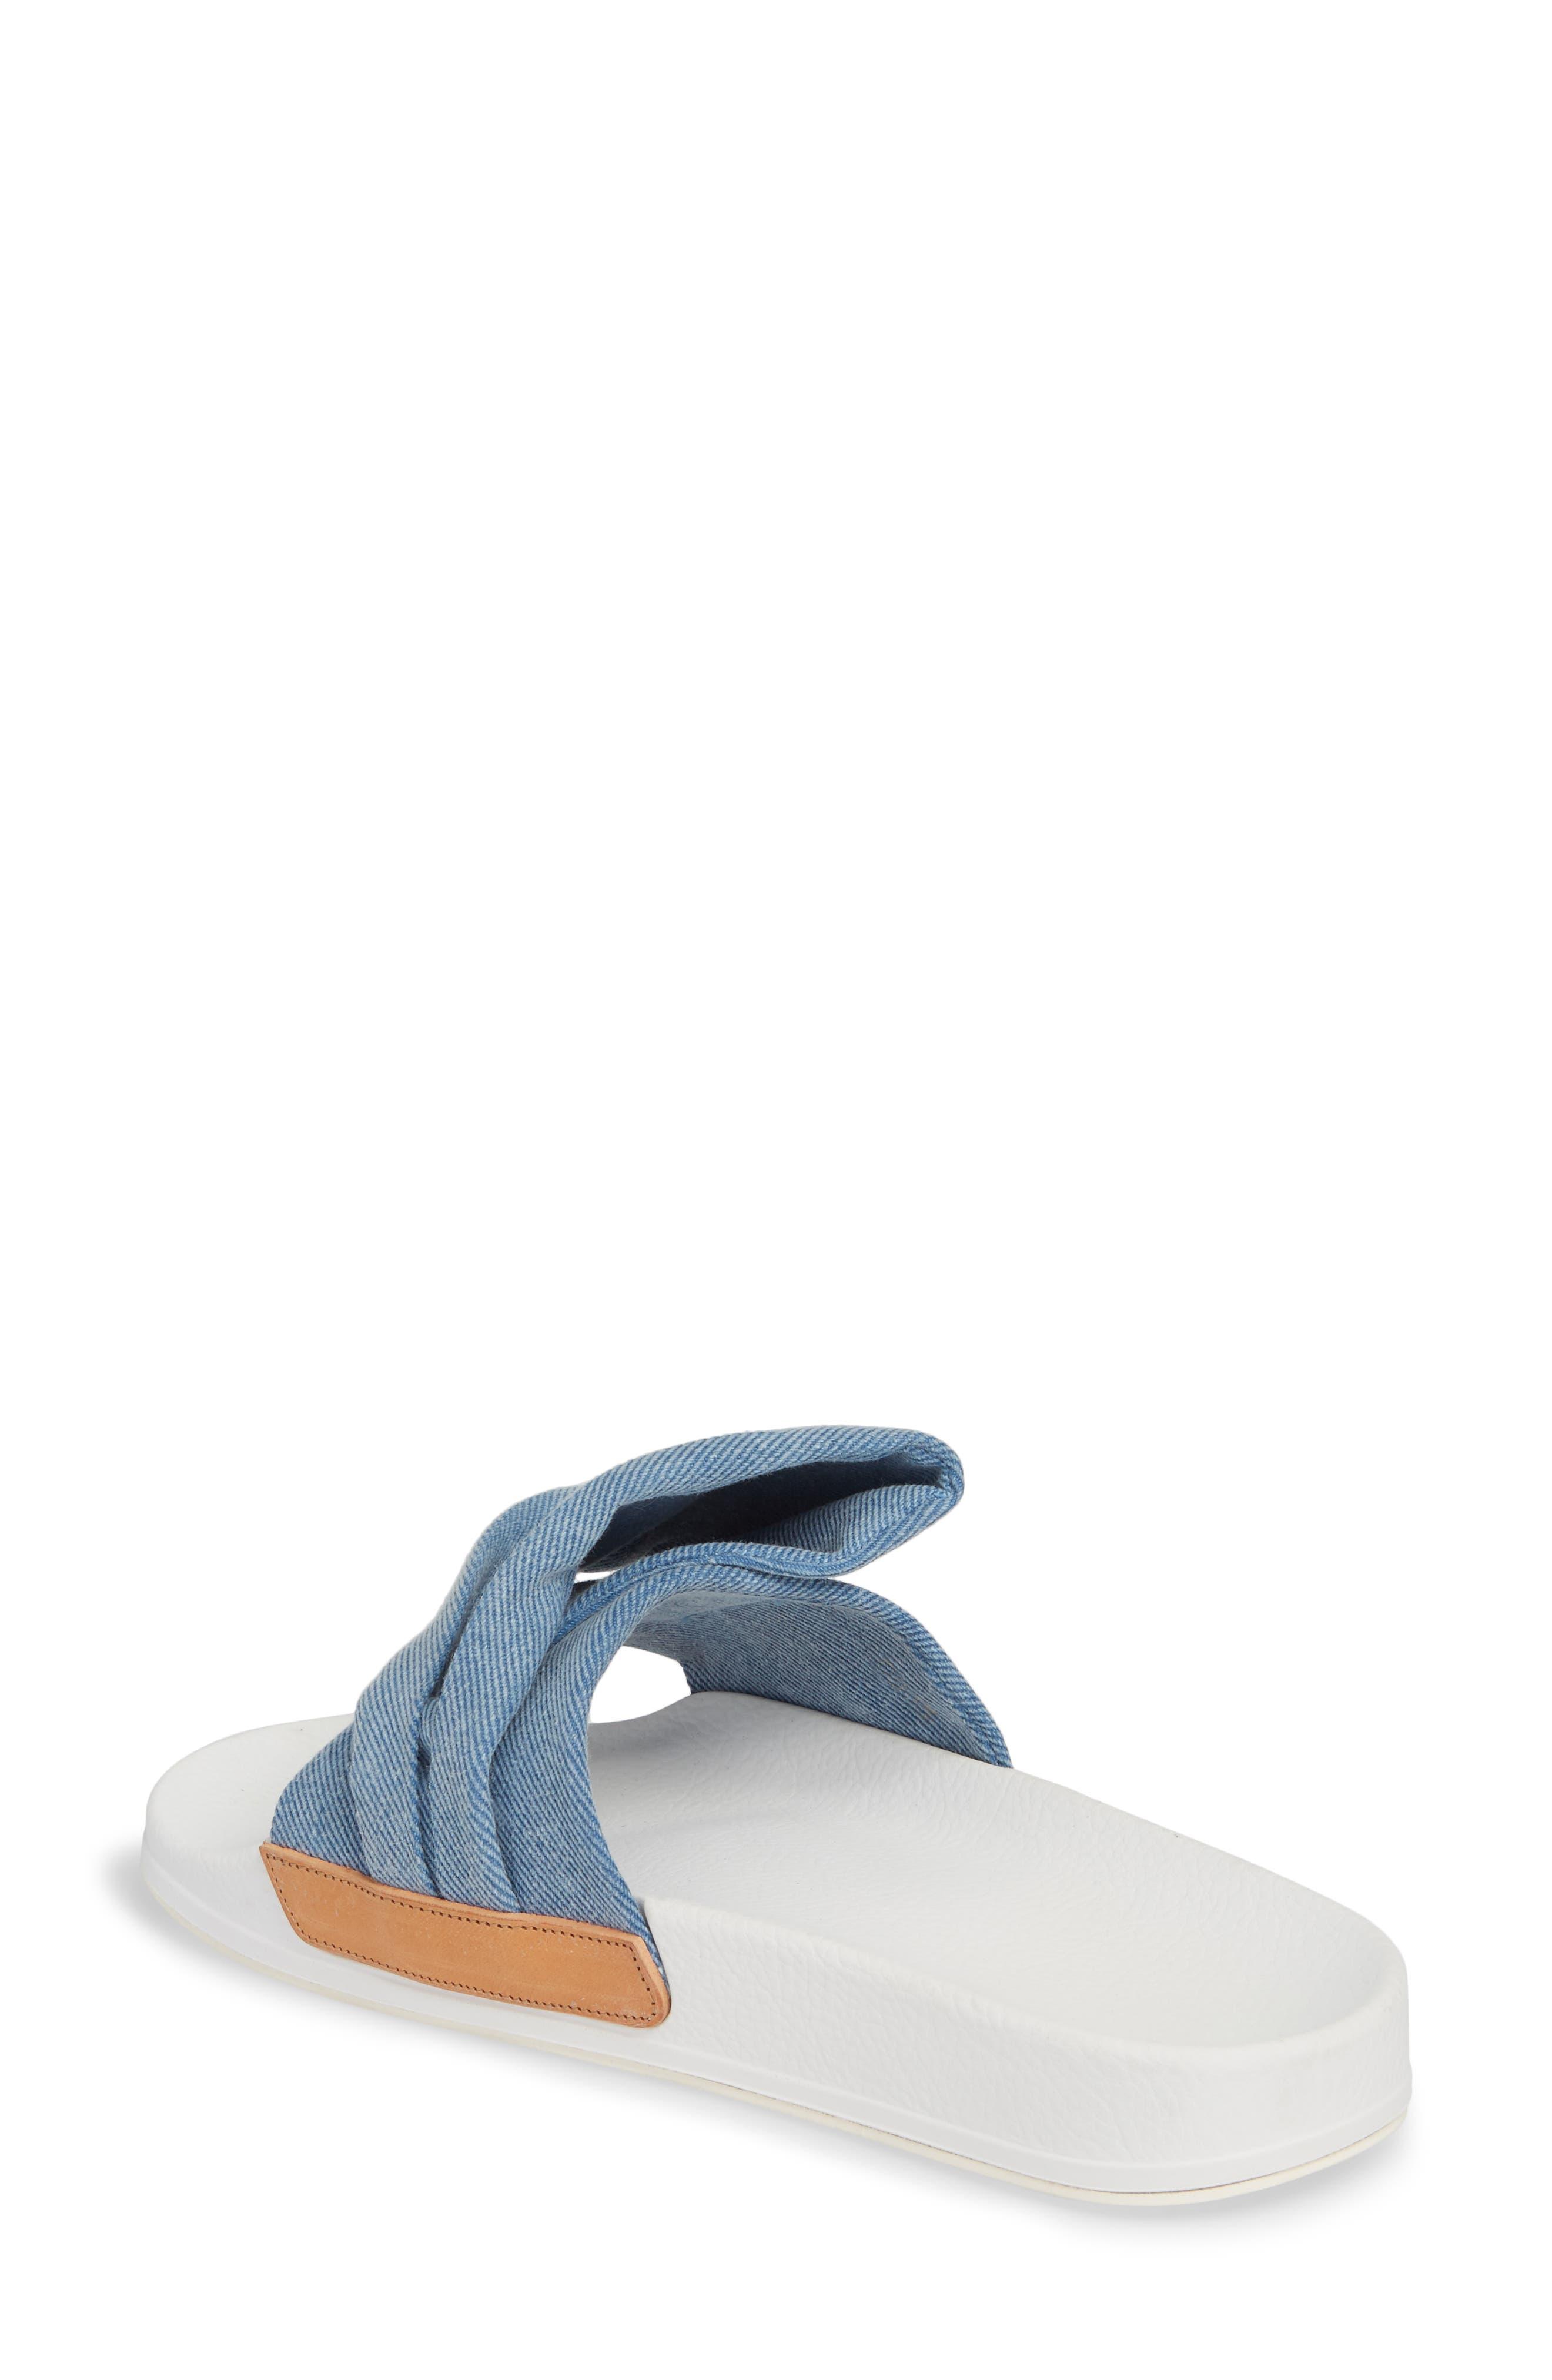 Wendyd Slide Sandal,                             Alternate thumbnail 2, color,                             400